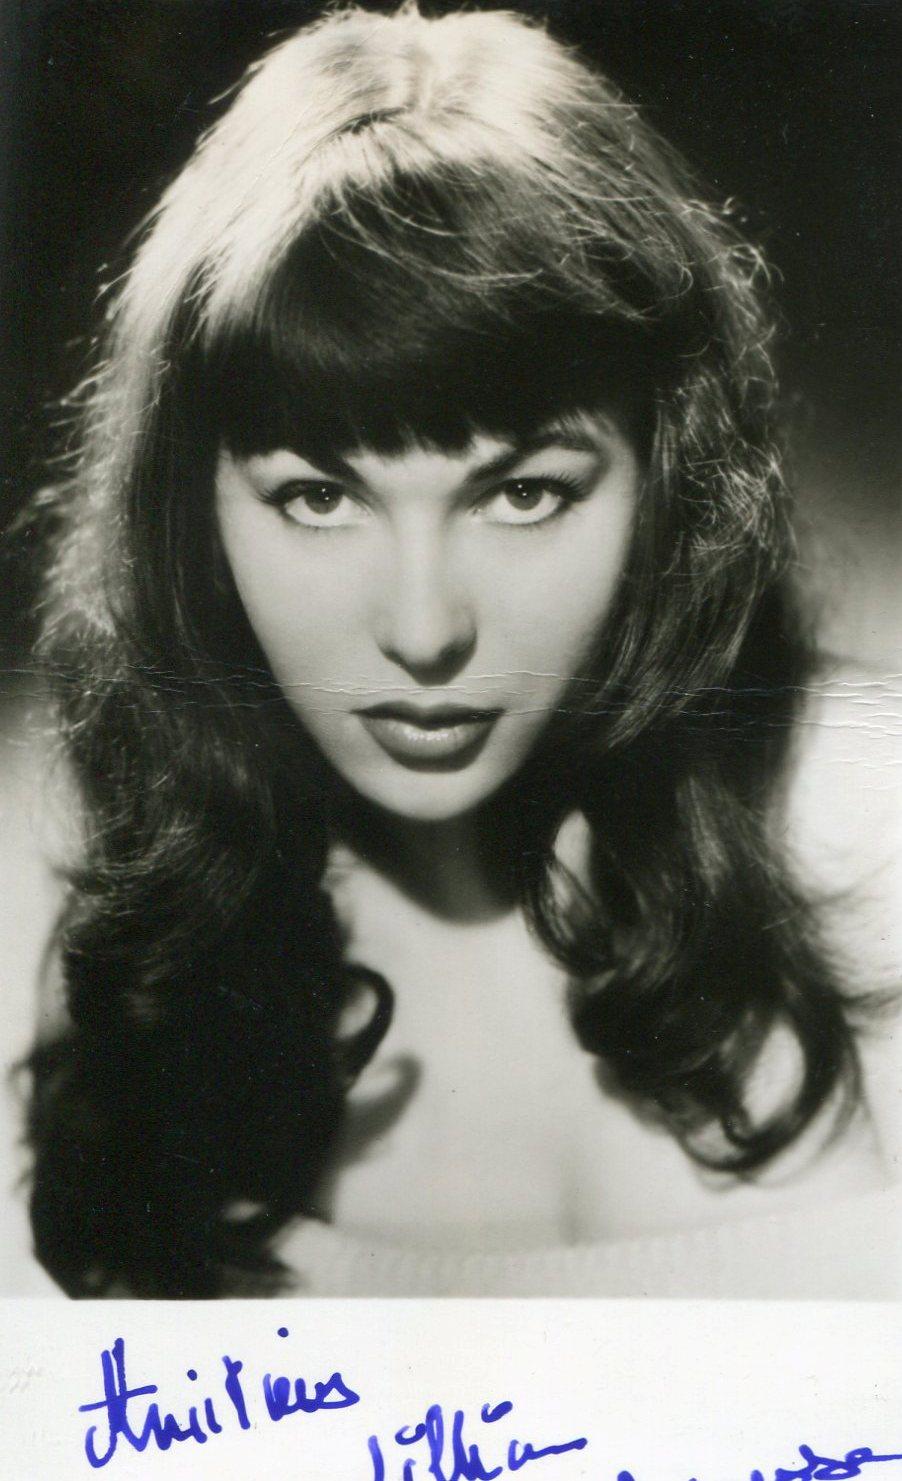 Cynthia Zamora (b. 1938)